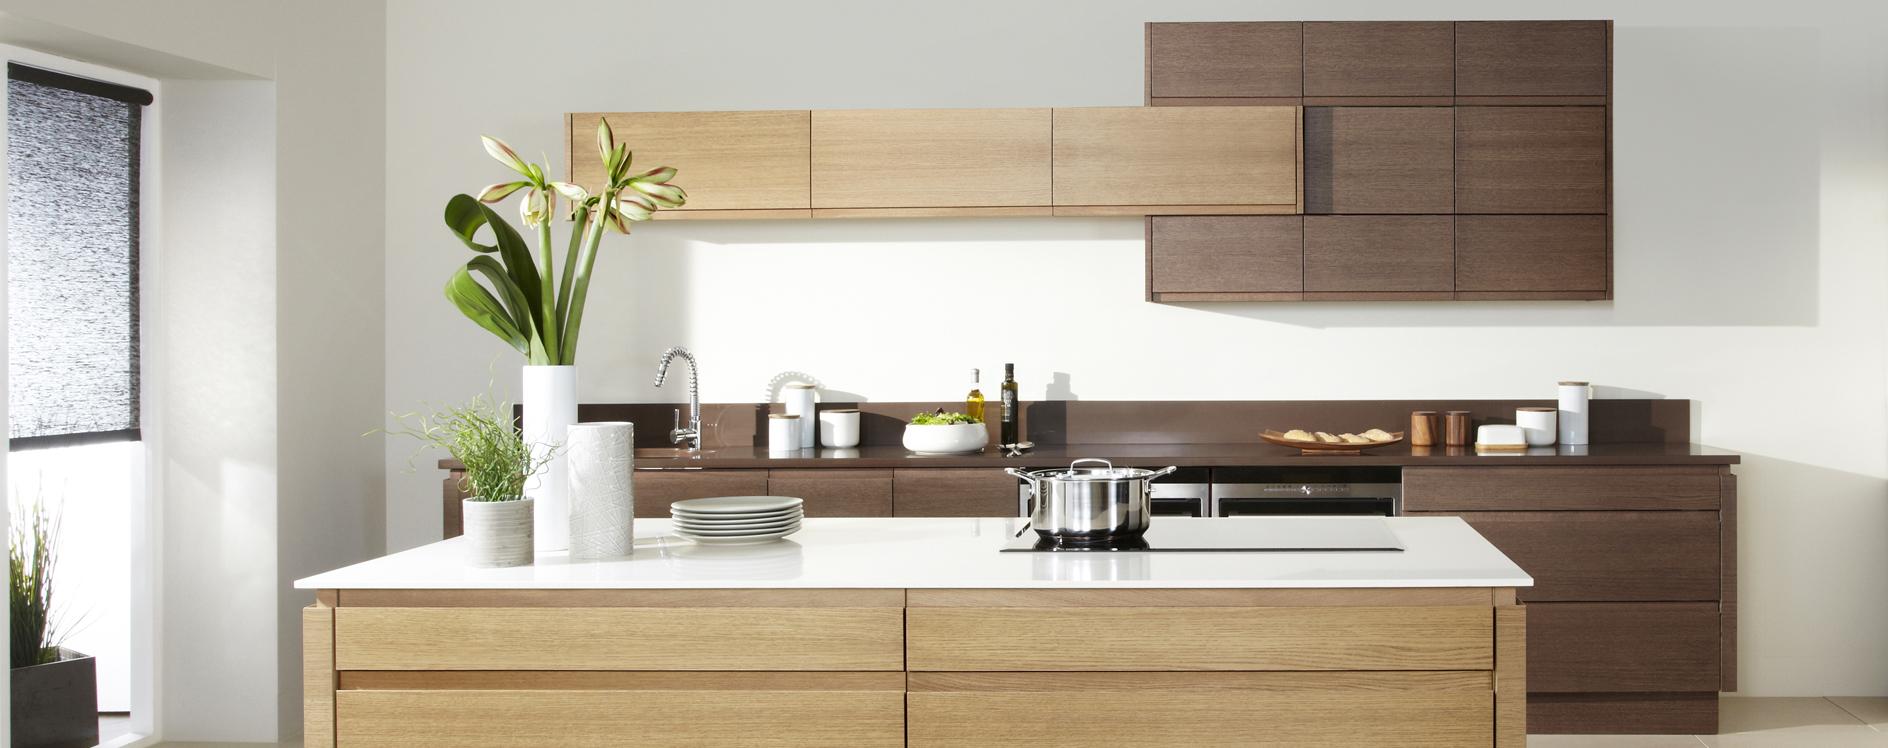 Malmo wood grain contemporary kitchen martha mockford for Wood grain kitchen doors